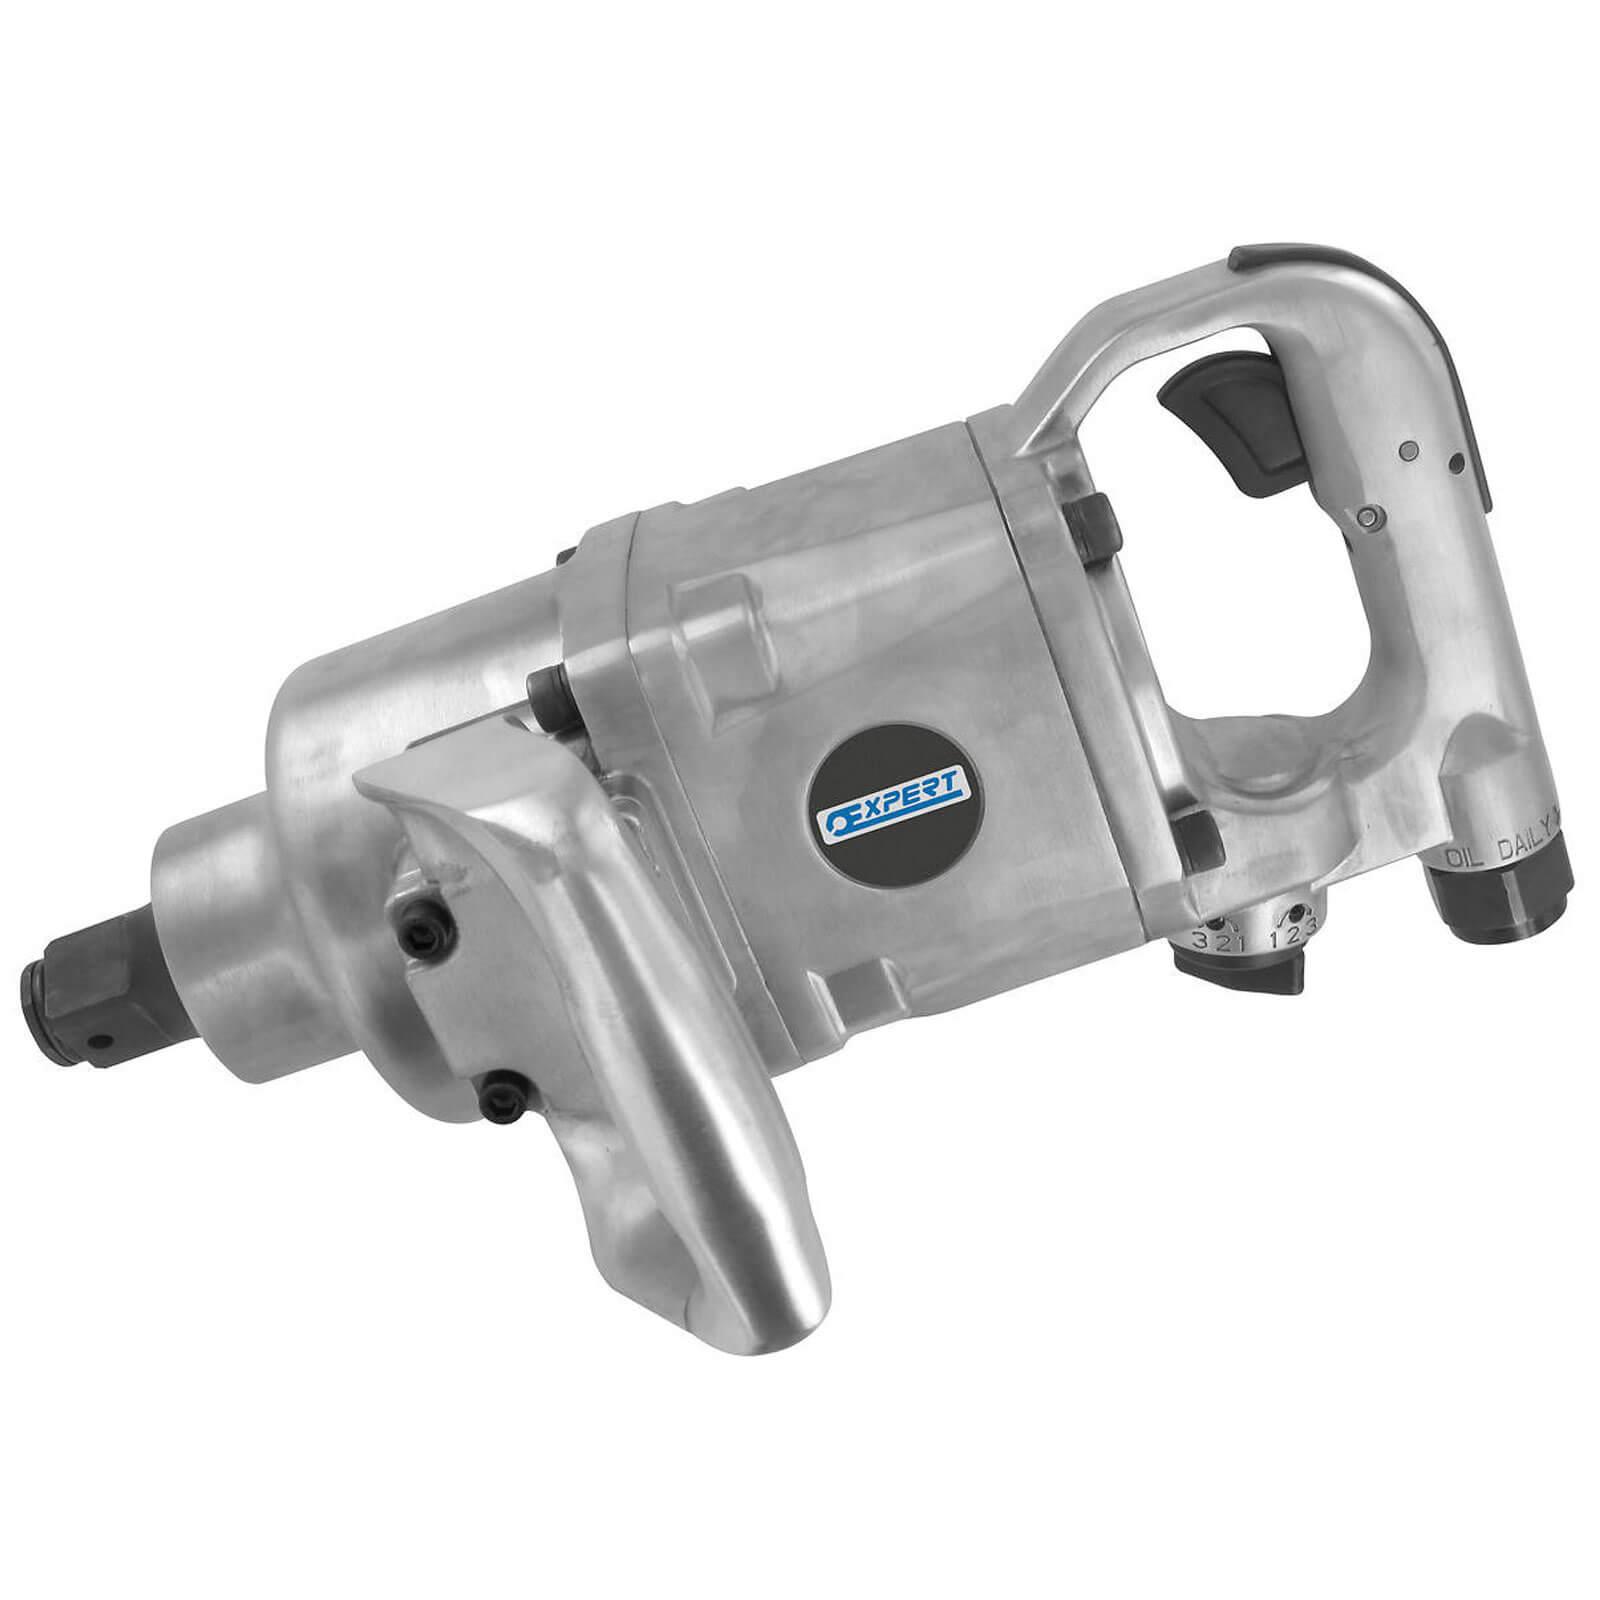 "Britool Expert E230125B 1"" Drive Short Anvil Impact Wrench 2170Nm"